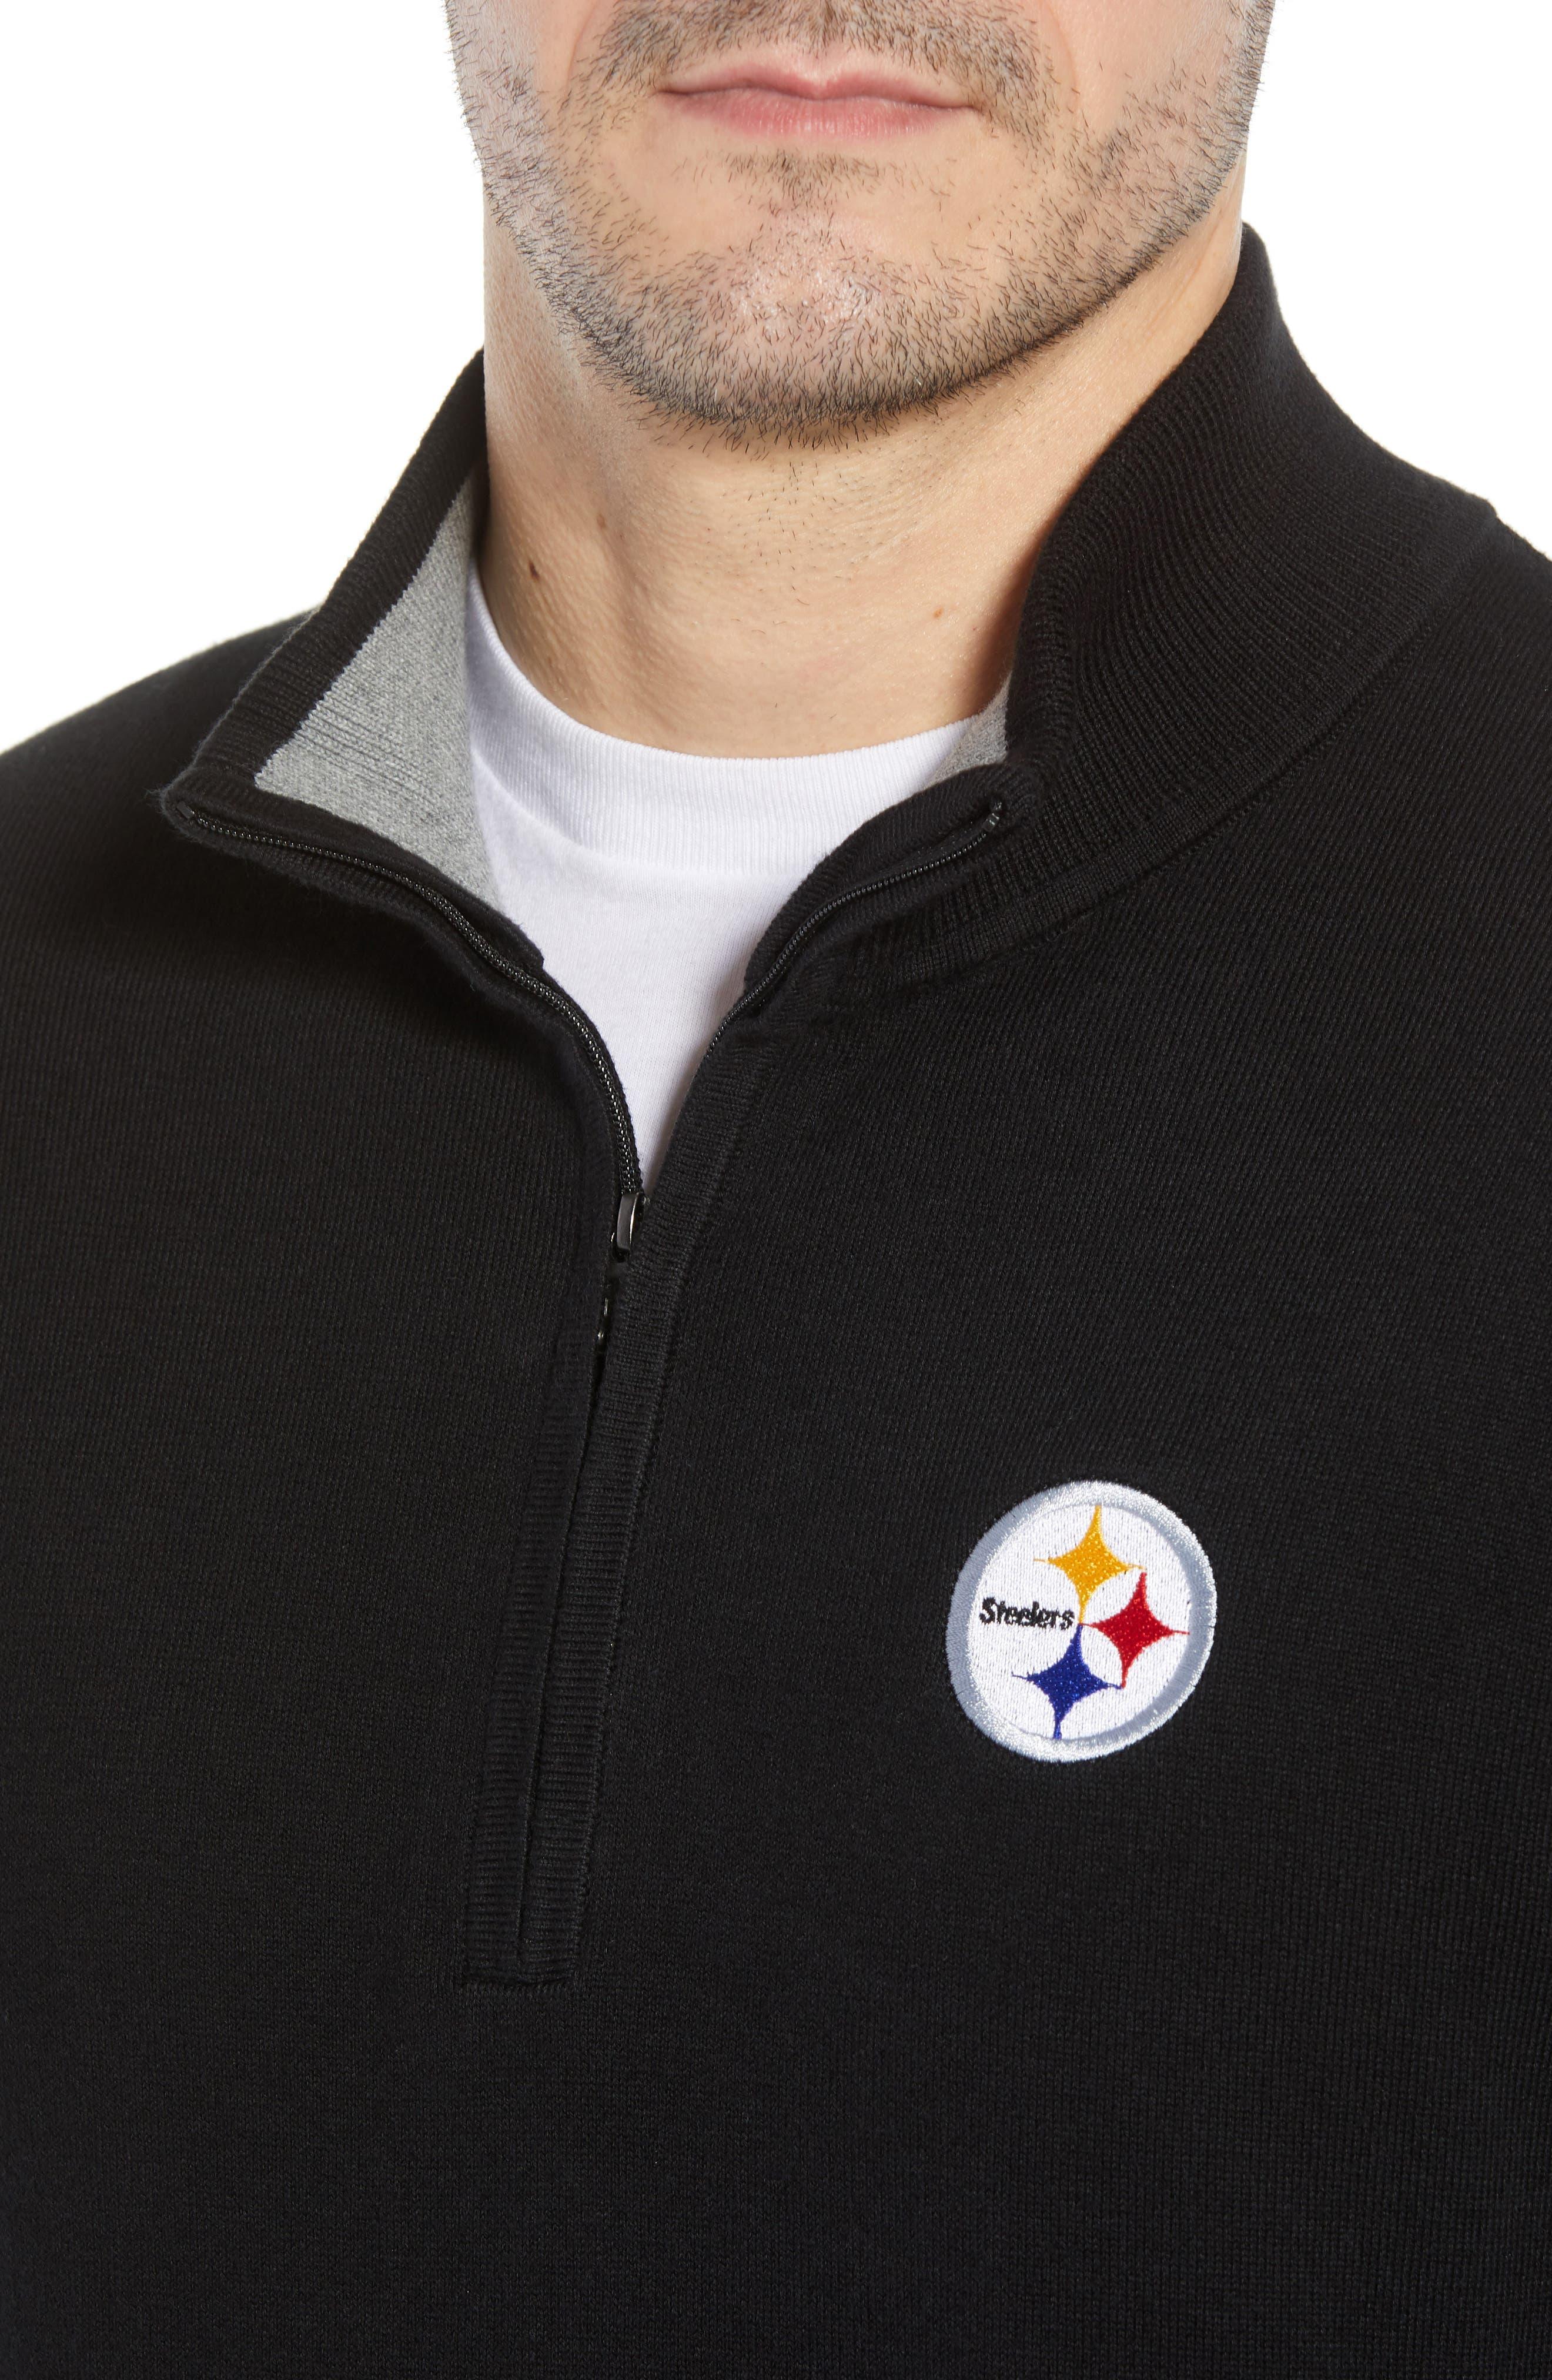 Pittsburgh Steelers - Lakemont Regular Fit Half Zip Sweater,                             Alternate thumbnail 4, color,                             001